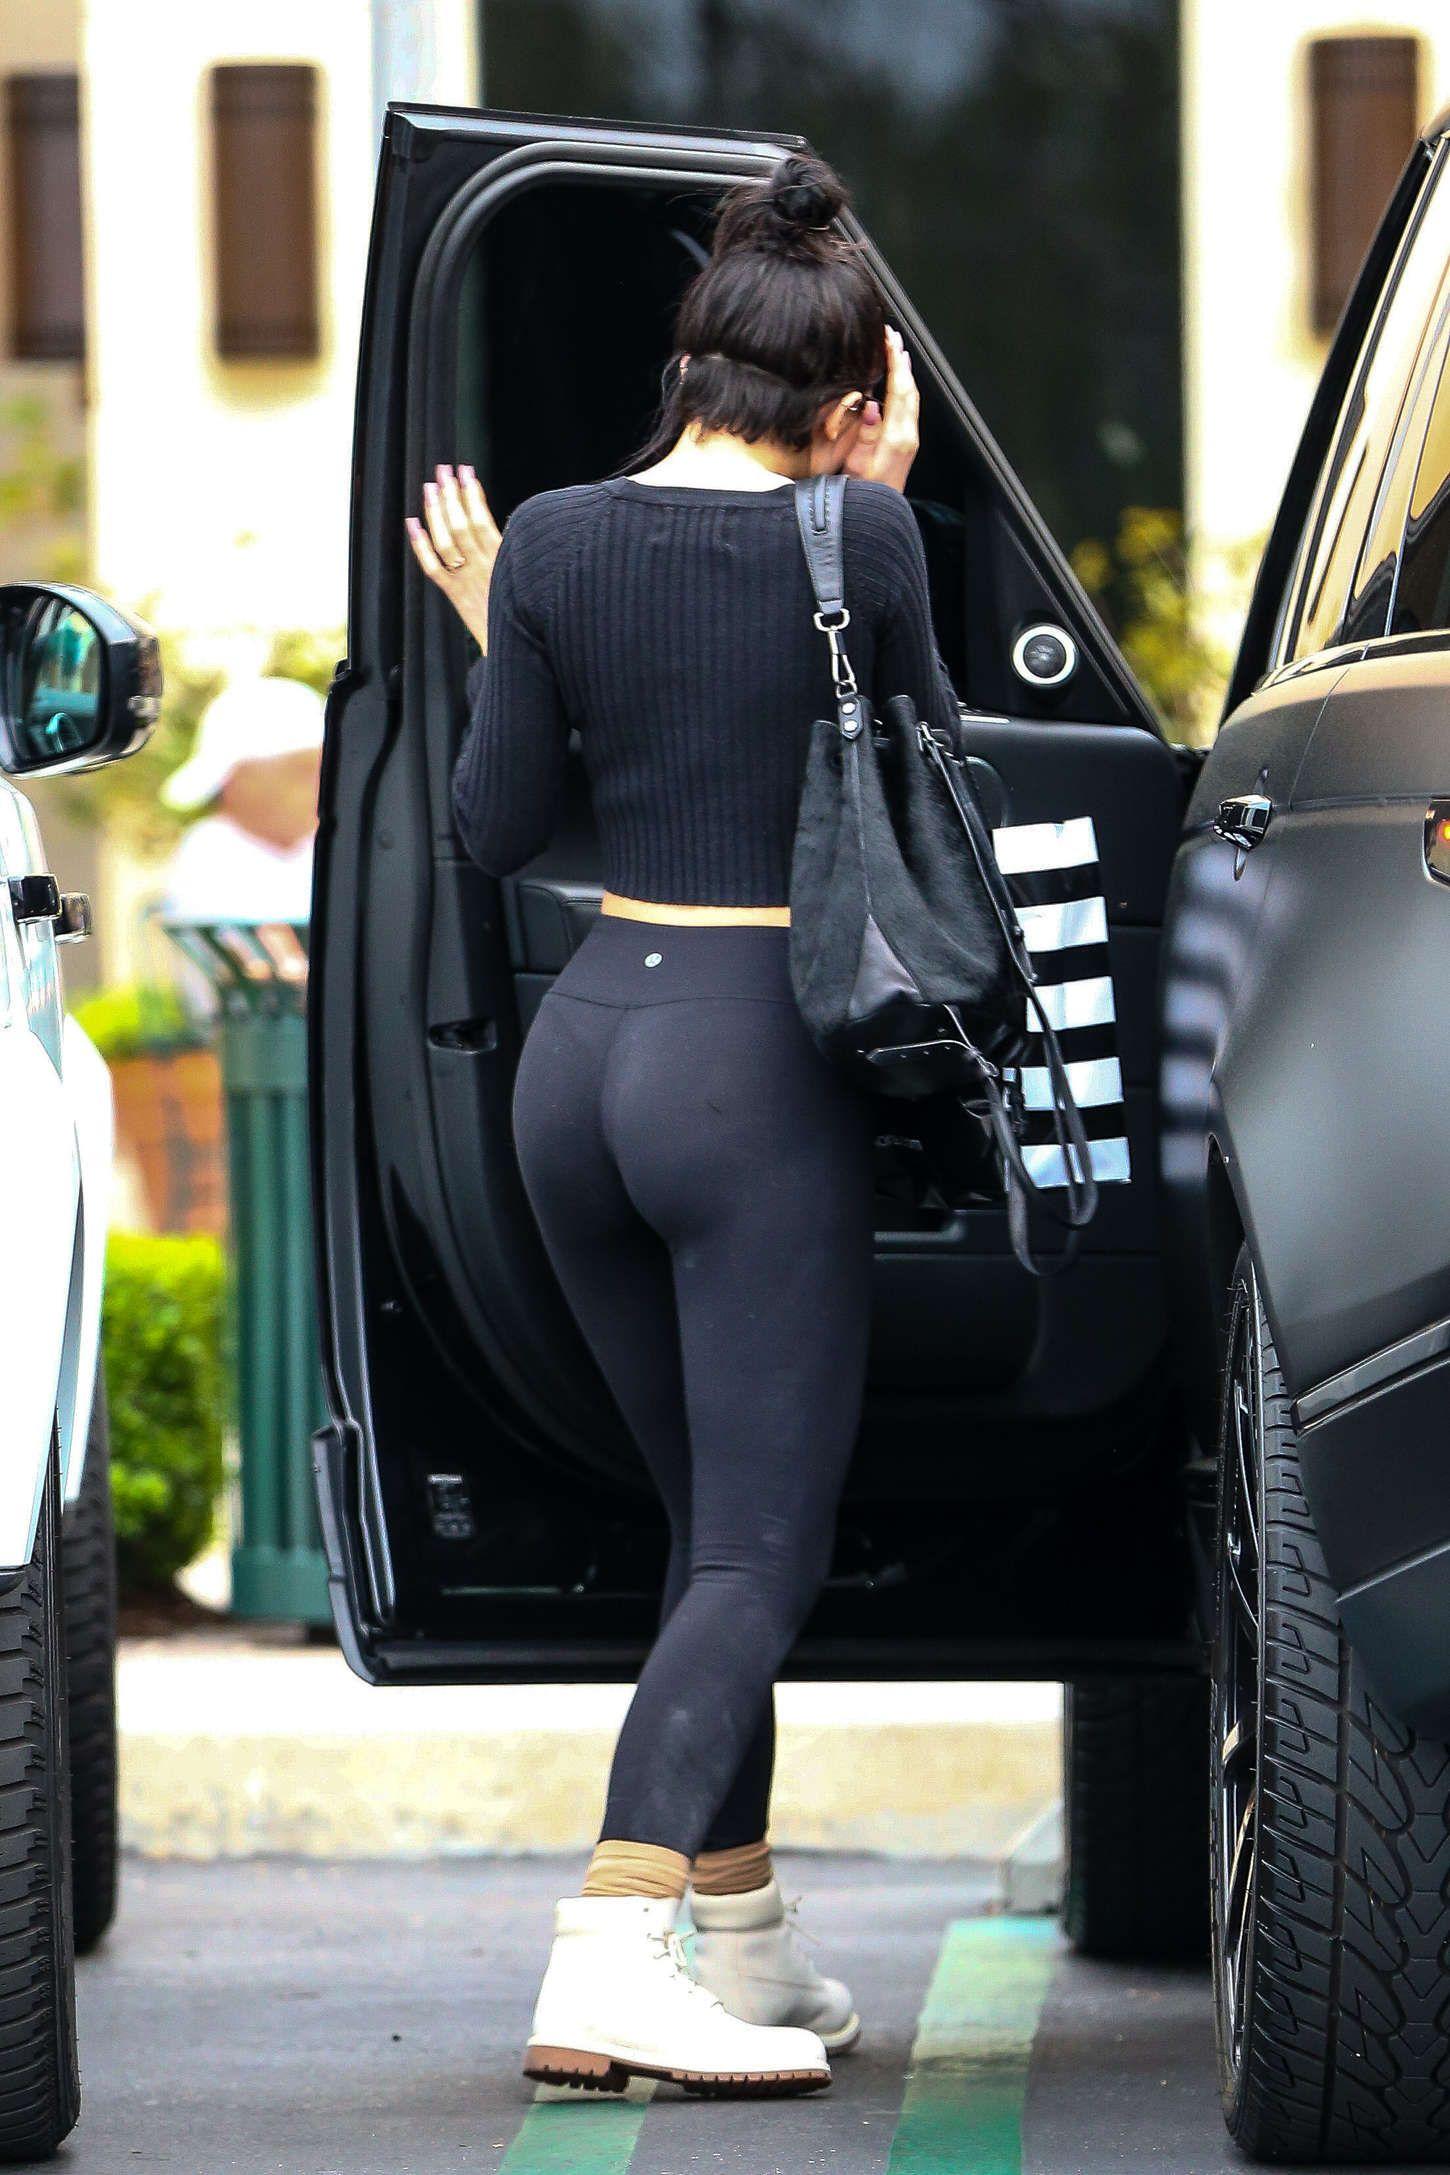 booty Kylie jenner